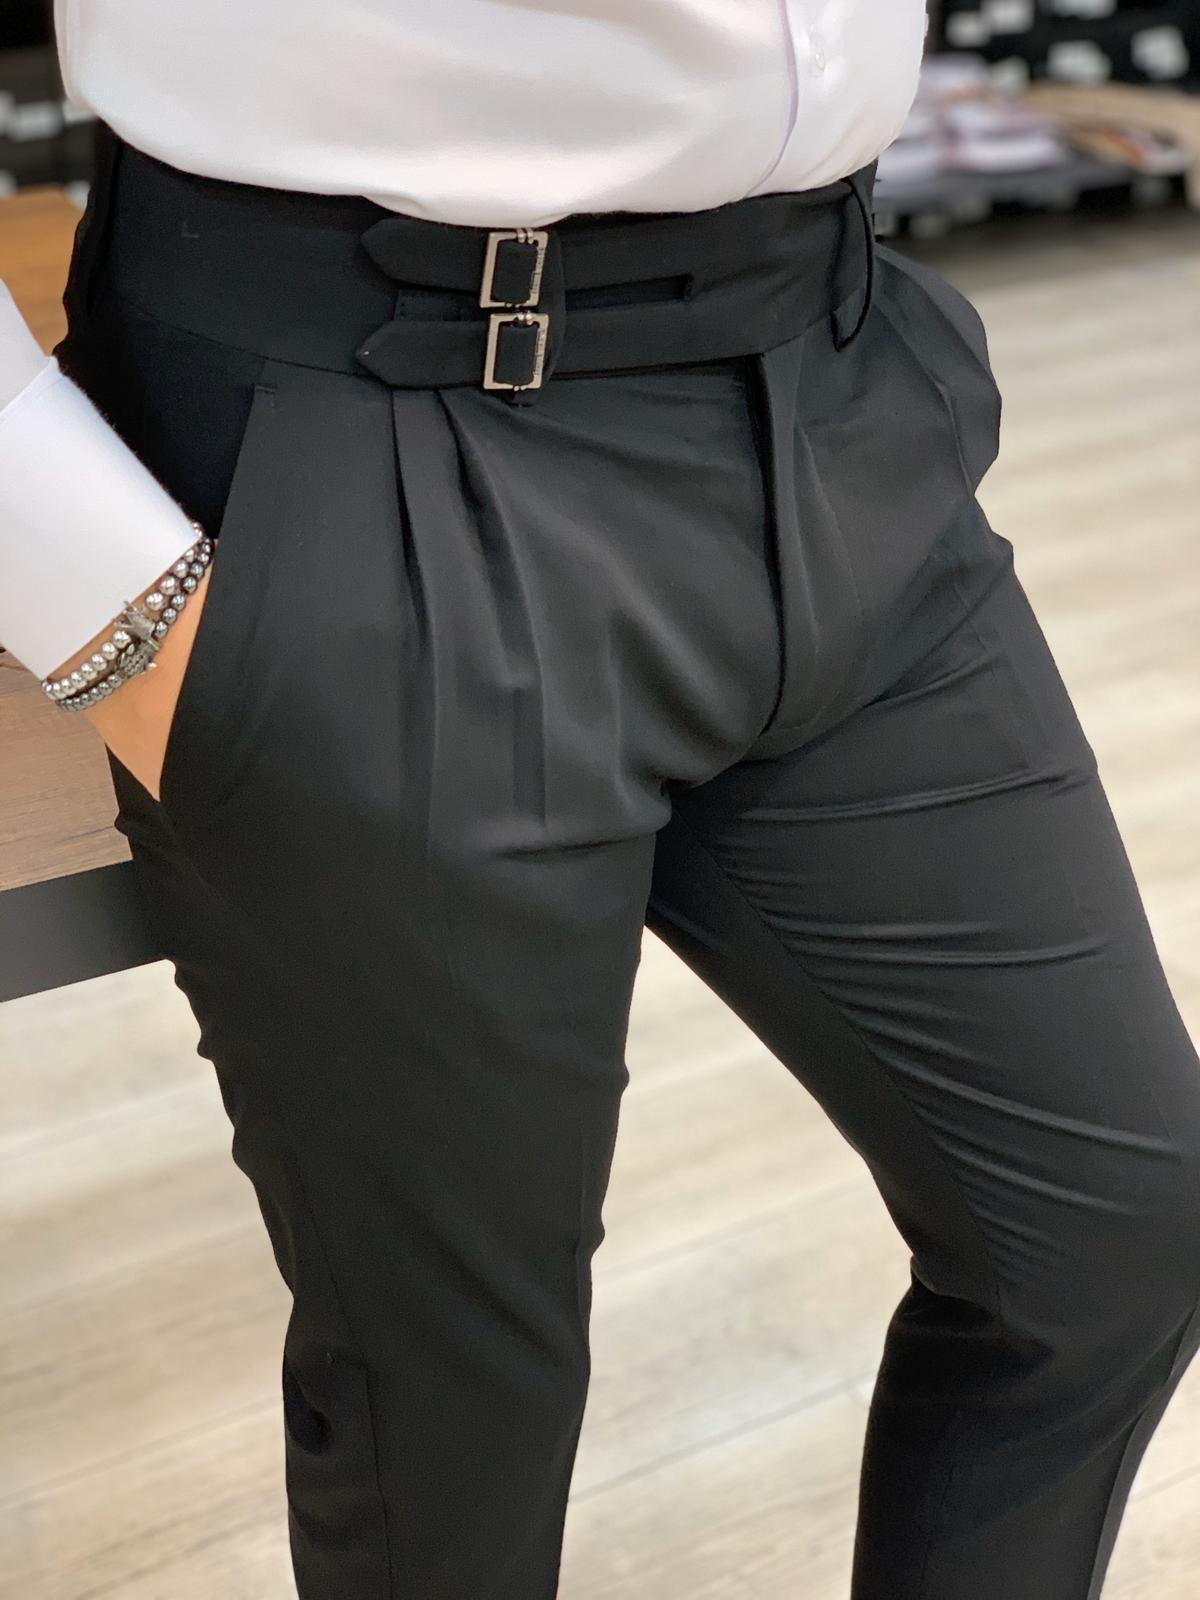 Aysoti Black Pleated Slim Fit Canvas Pants Mens Pants Fashion Black Pants Men Pants Outfit Men [ 1600 x 1200 Pixel ]